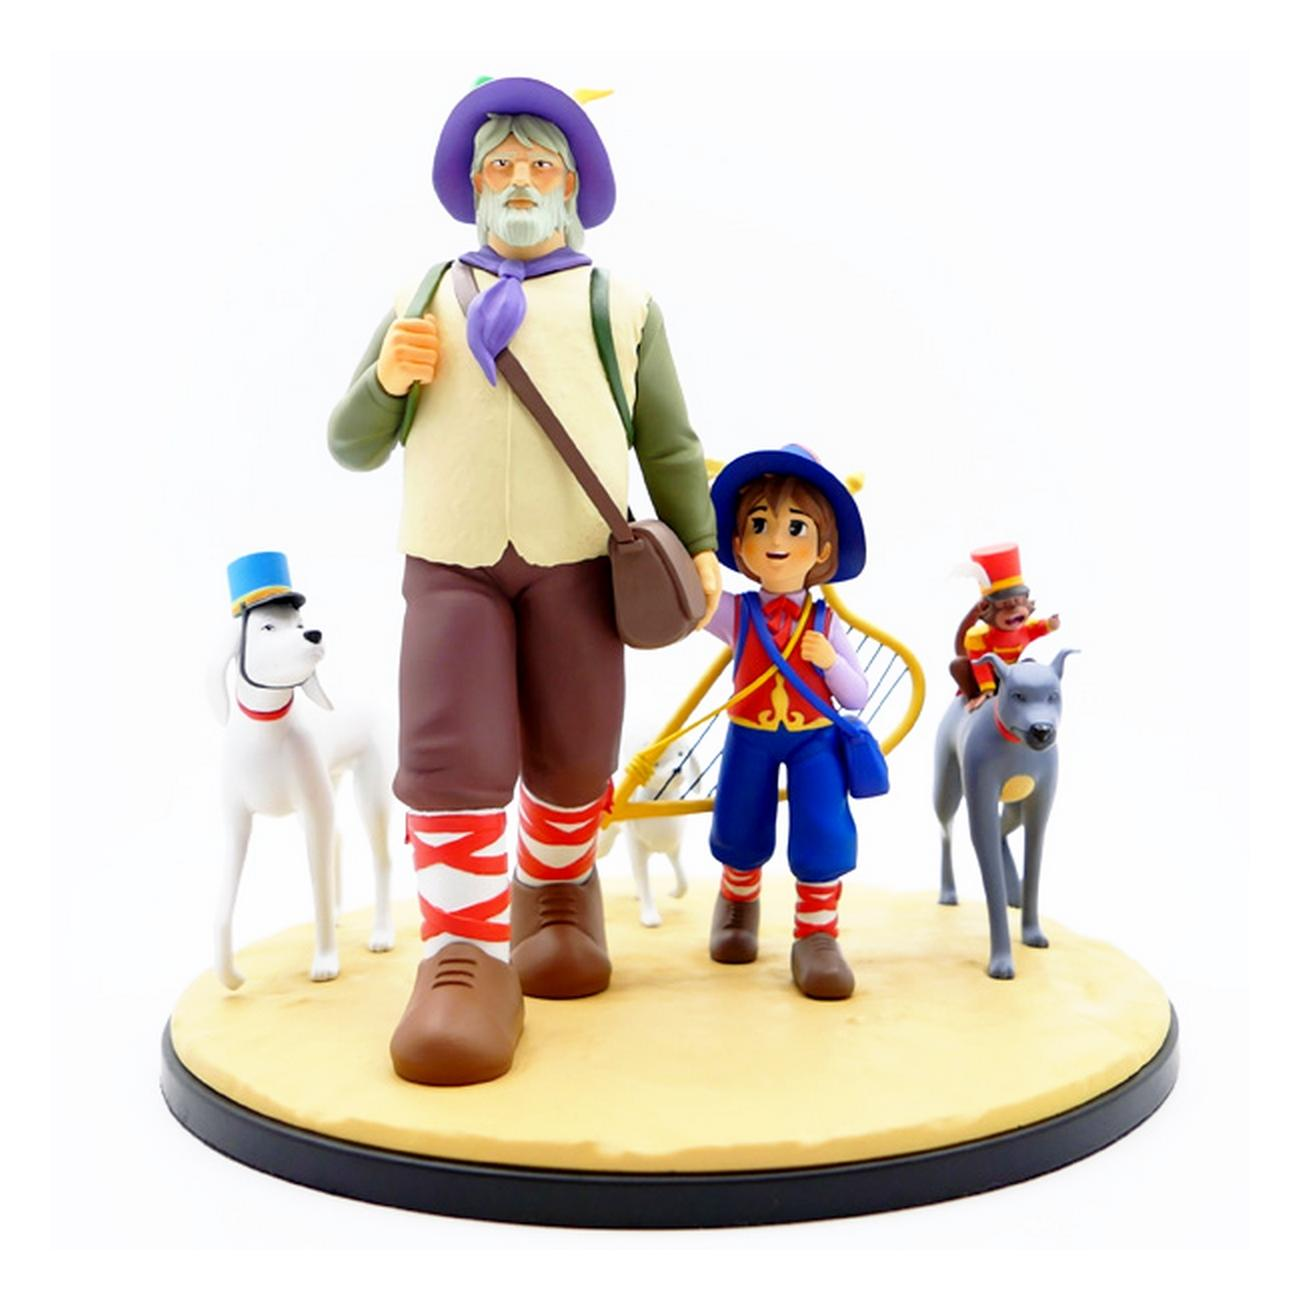 Remi sans famille resine diorama 22cm suukoo toys figurine